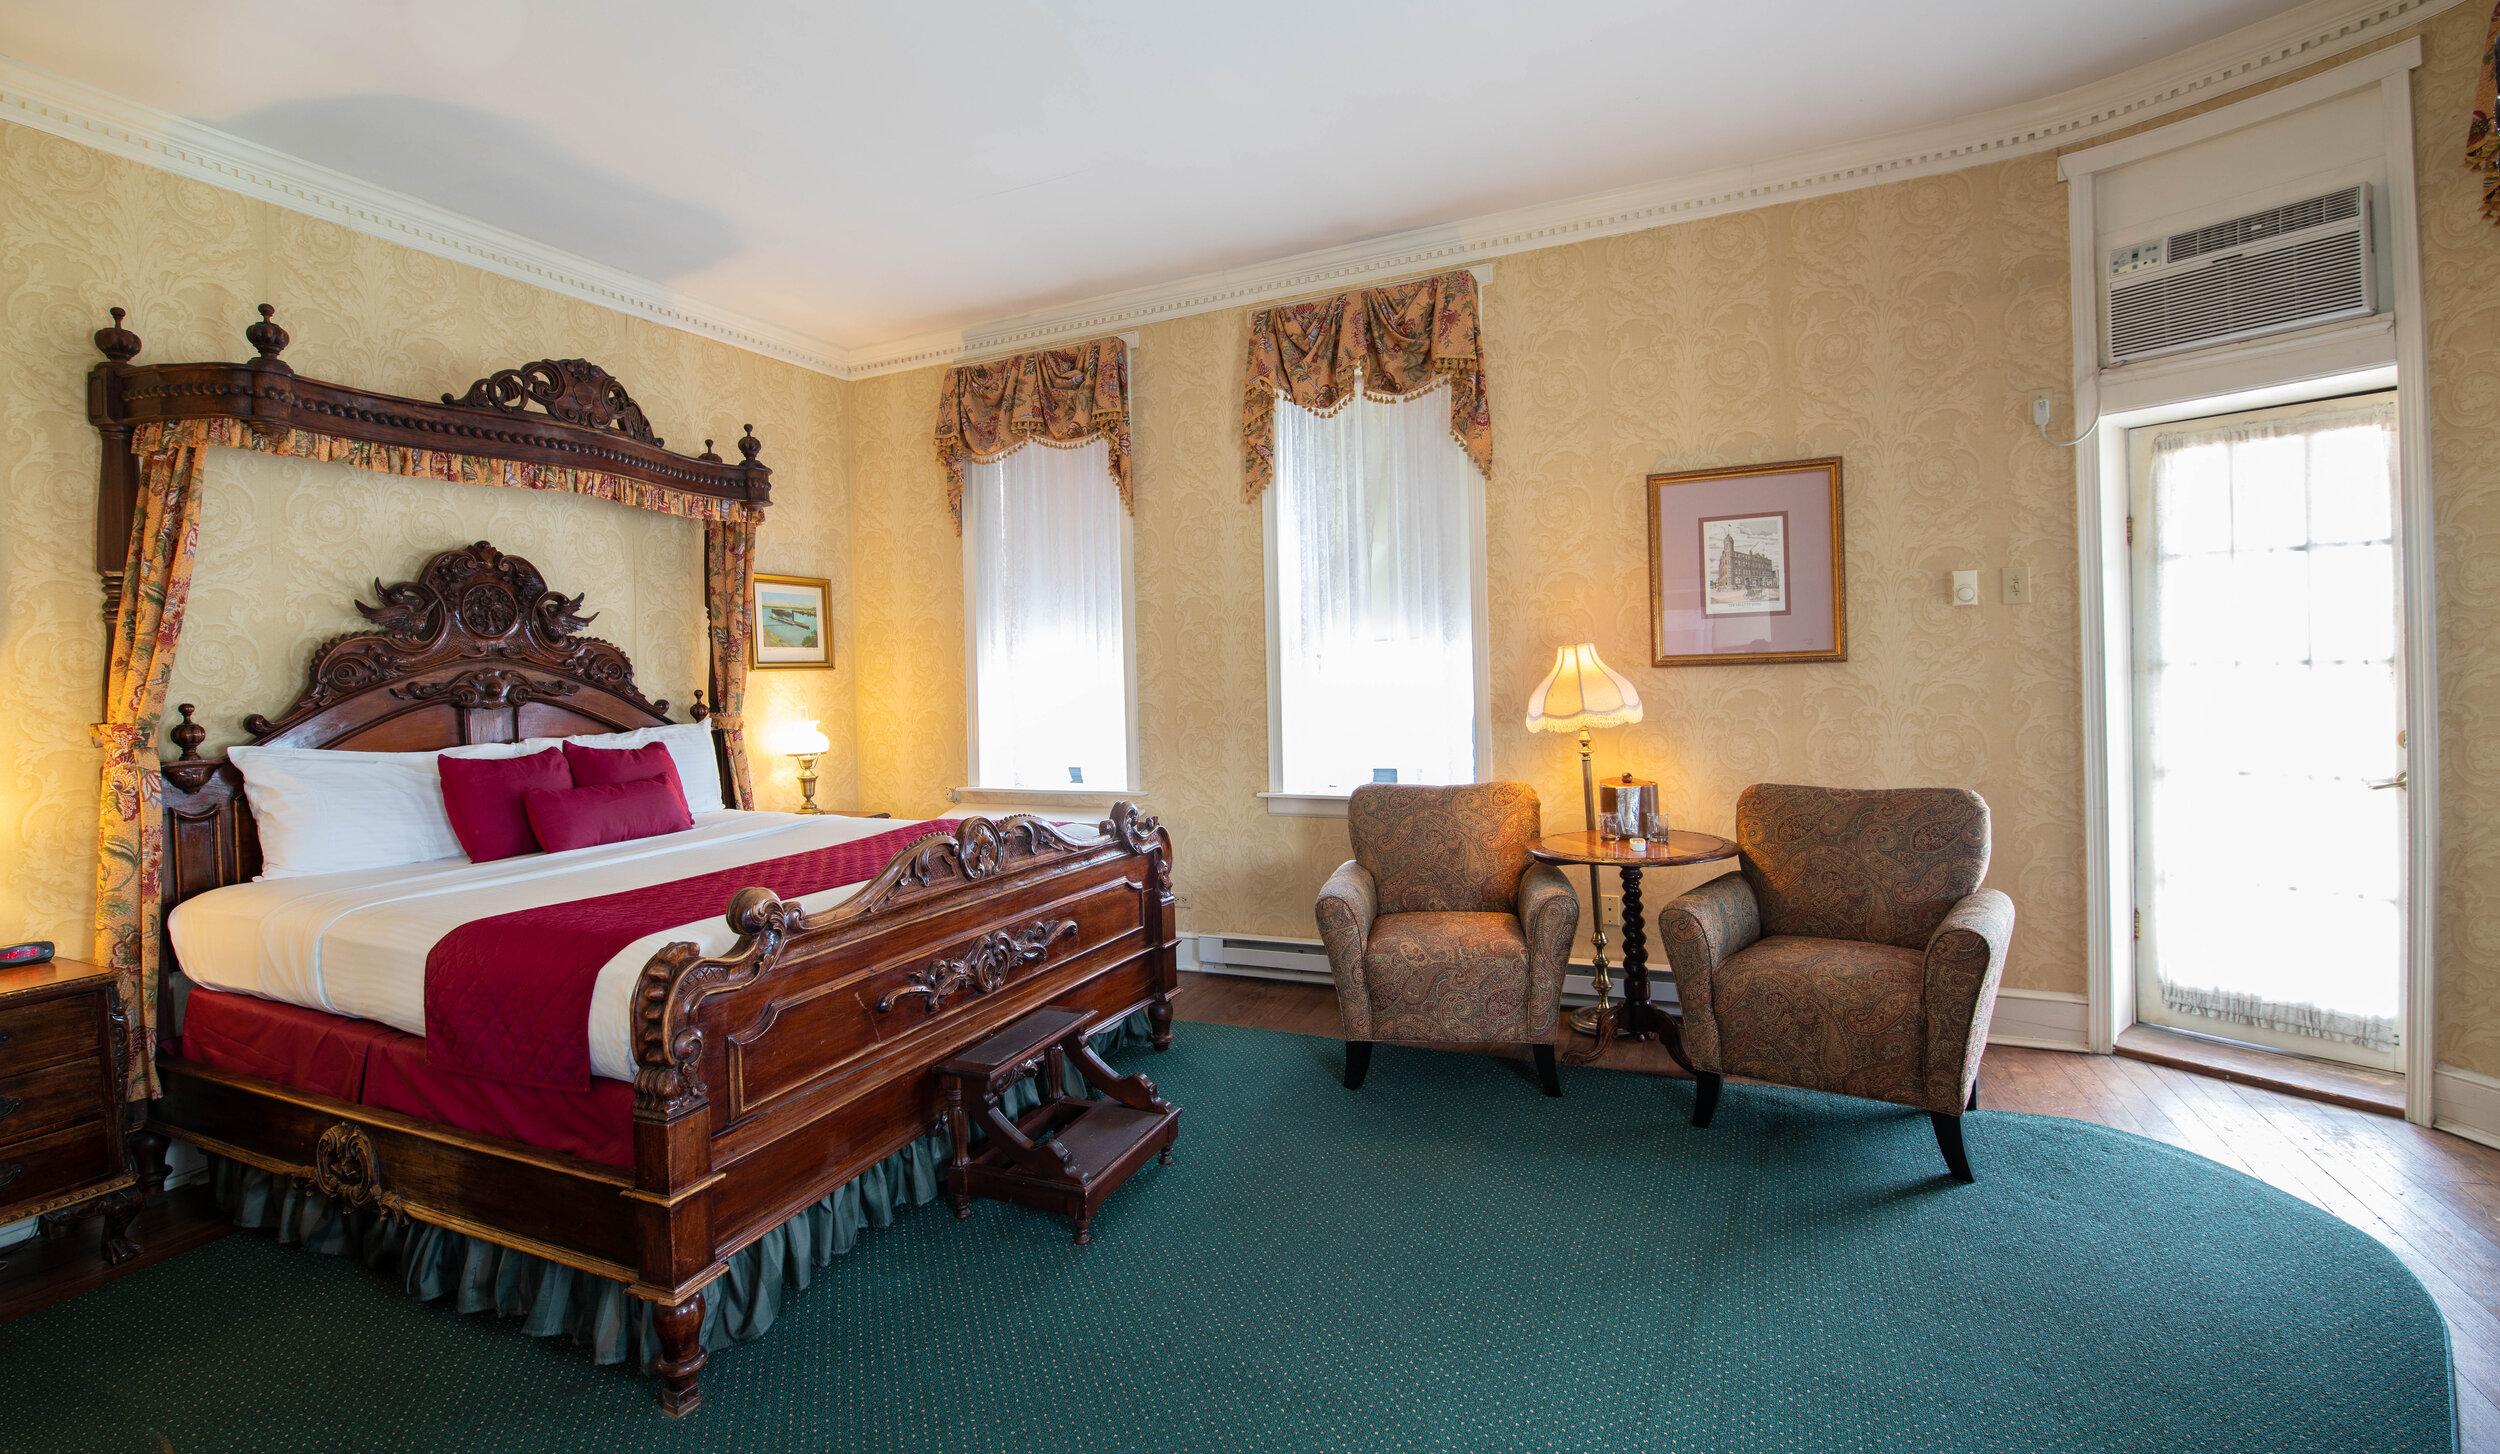 RV King Parlor with Balcony Room 304 - 2.jpg